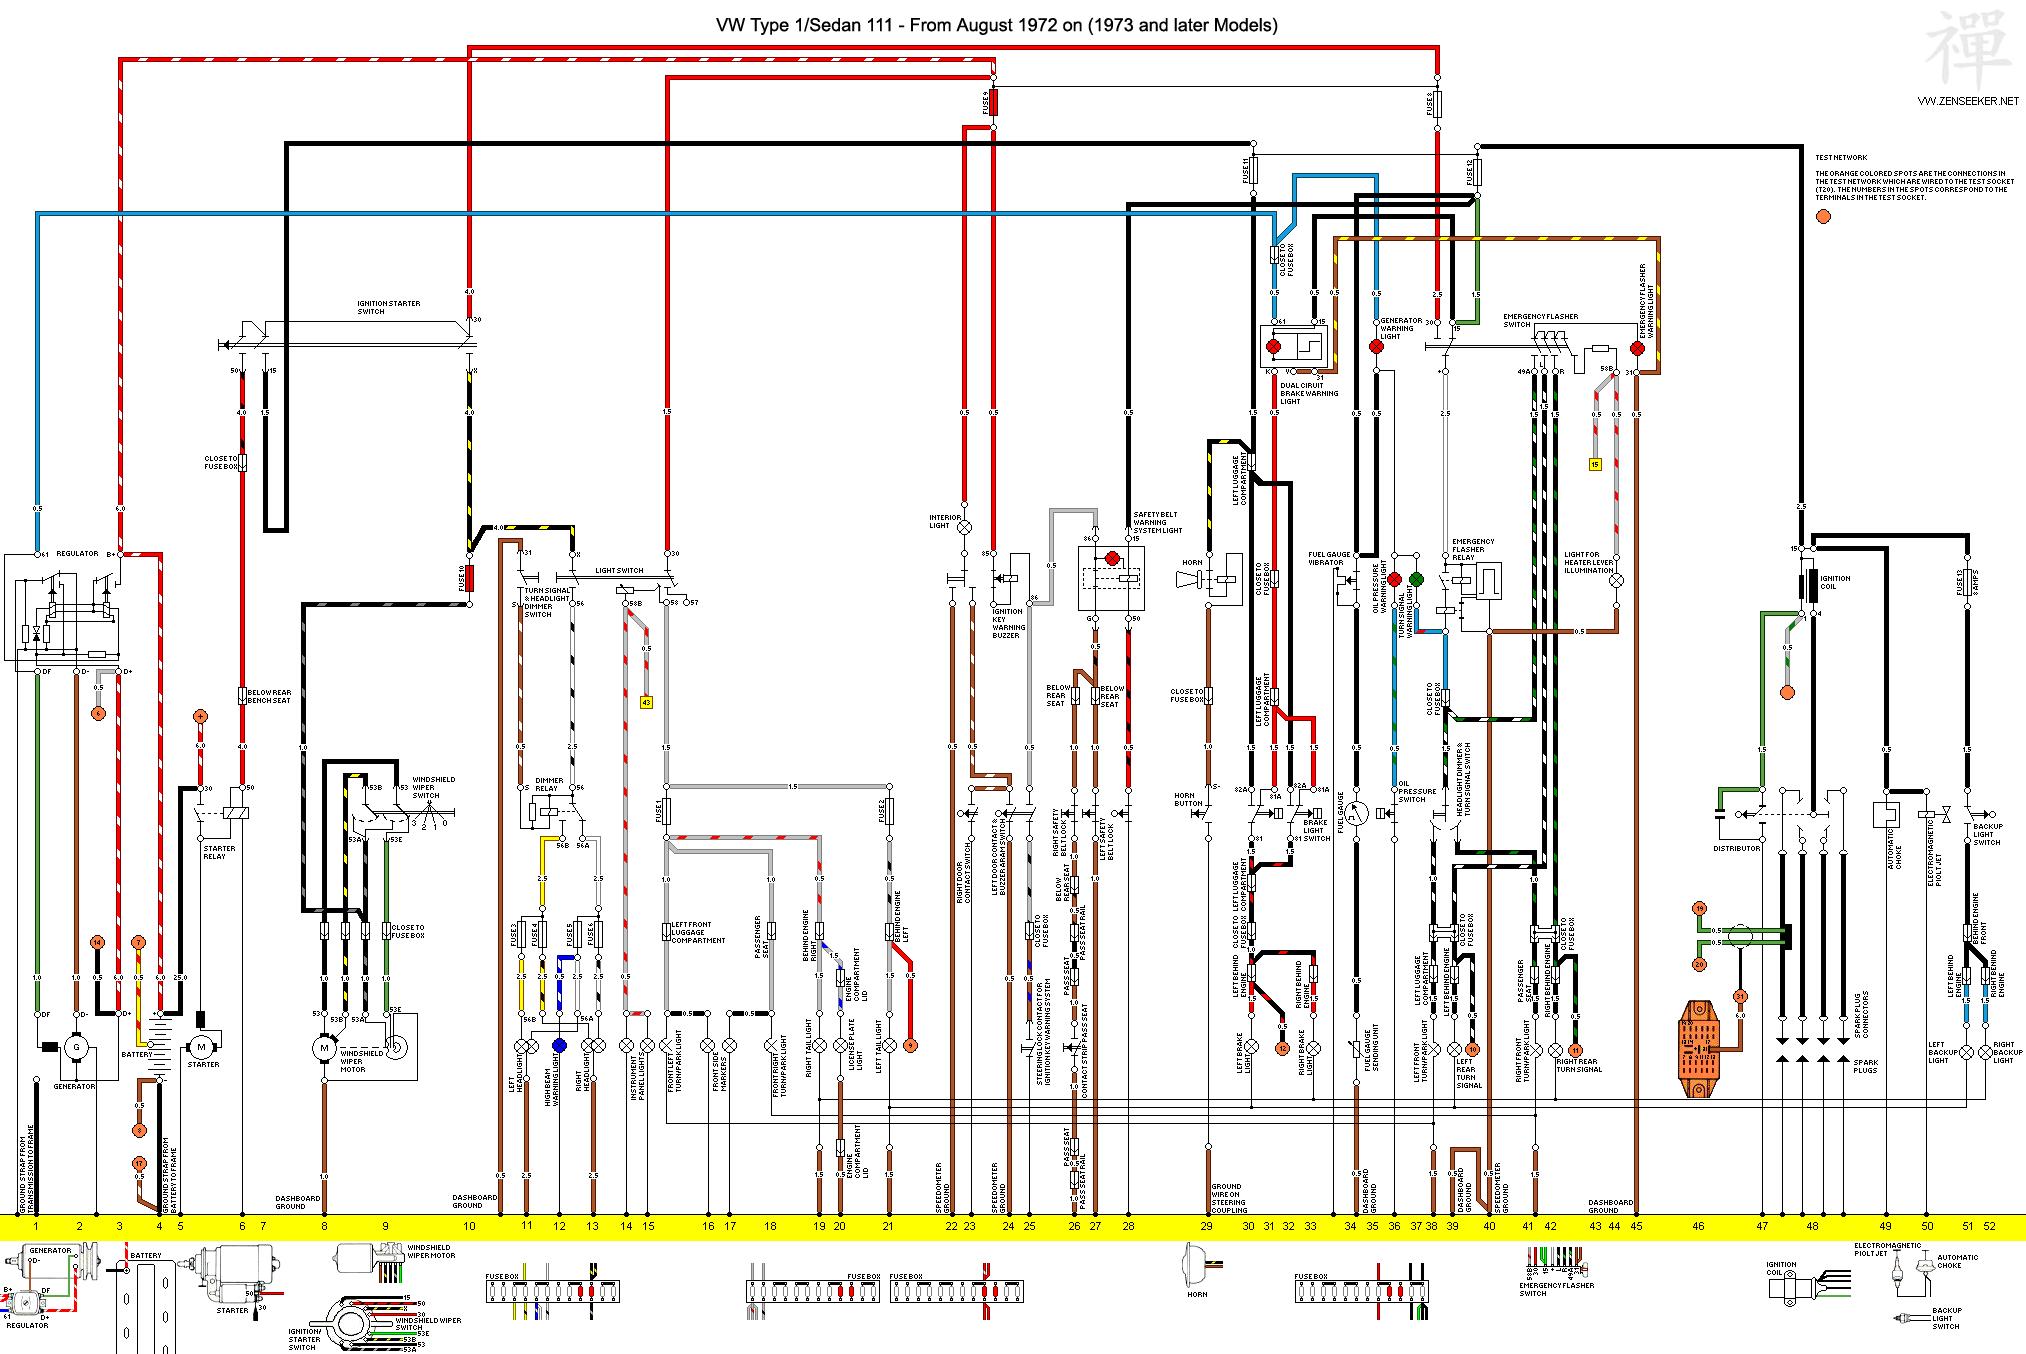 1973 karmann ghia wiring diagram tv 1437  wiring besides 1974 vw beetle wiring diagram on 72 vw  besides 1974 vw beetle wiring diagram